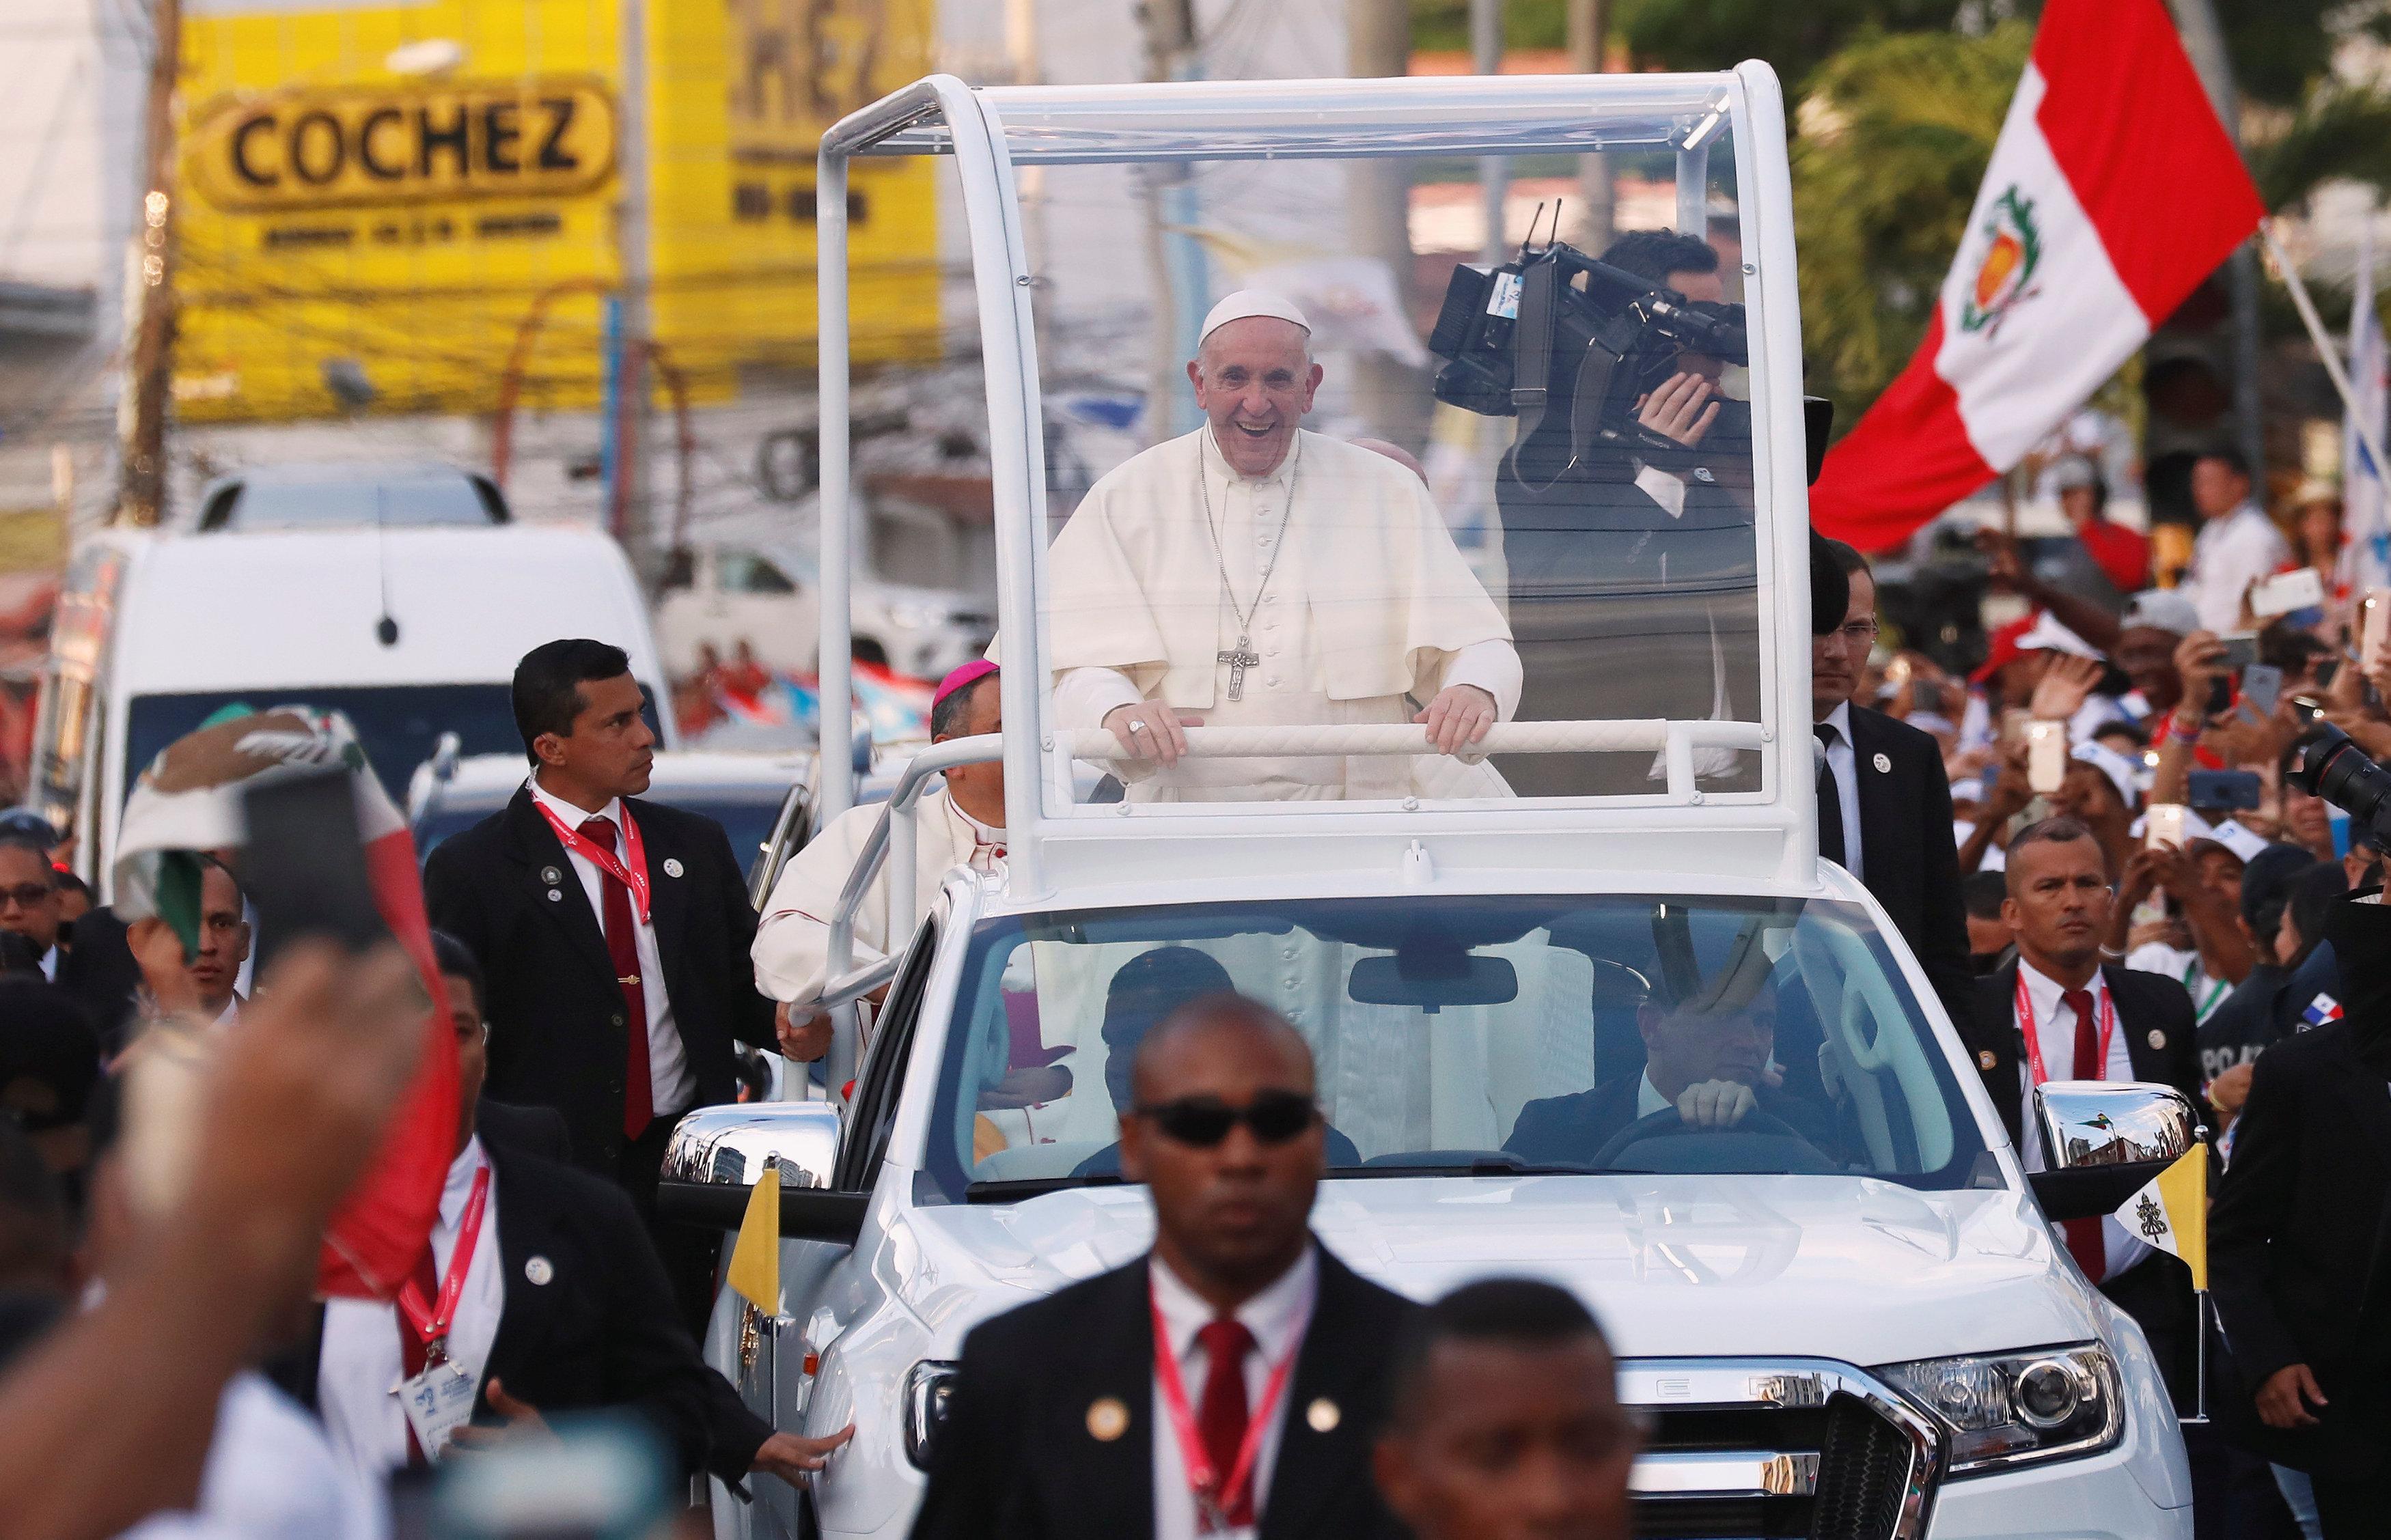 استقبال حاشد لبابا الفاتيكان لدى وصوله بنما  (7)